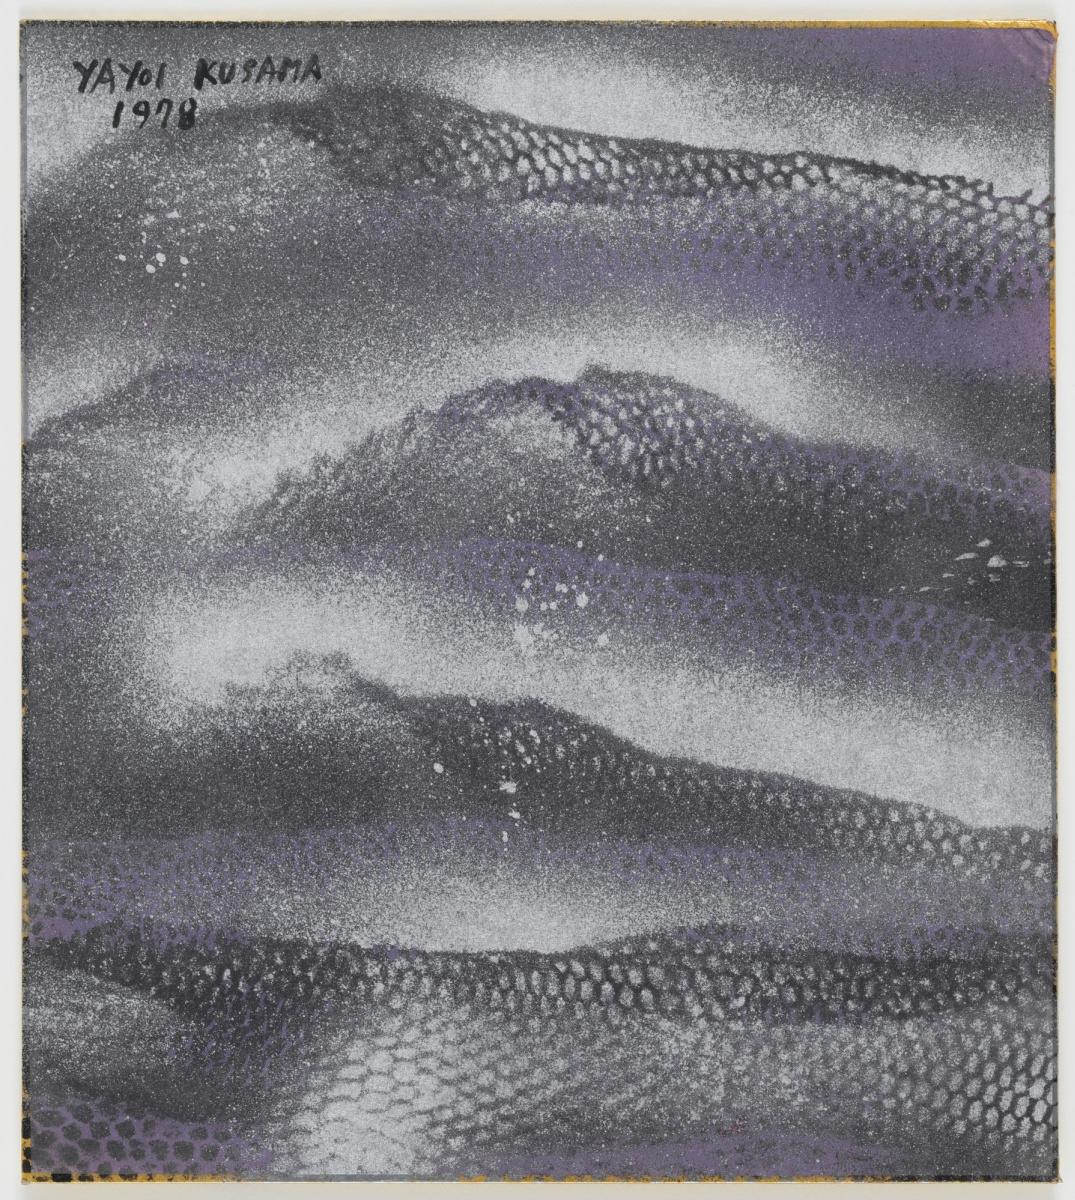 Yayoi Kusama. The Atlantic Ocean